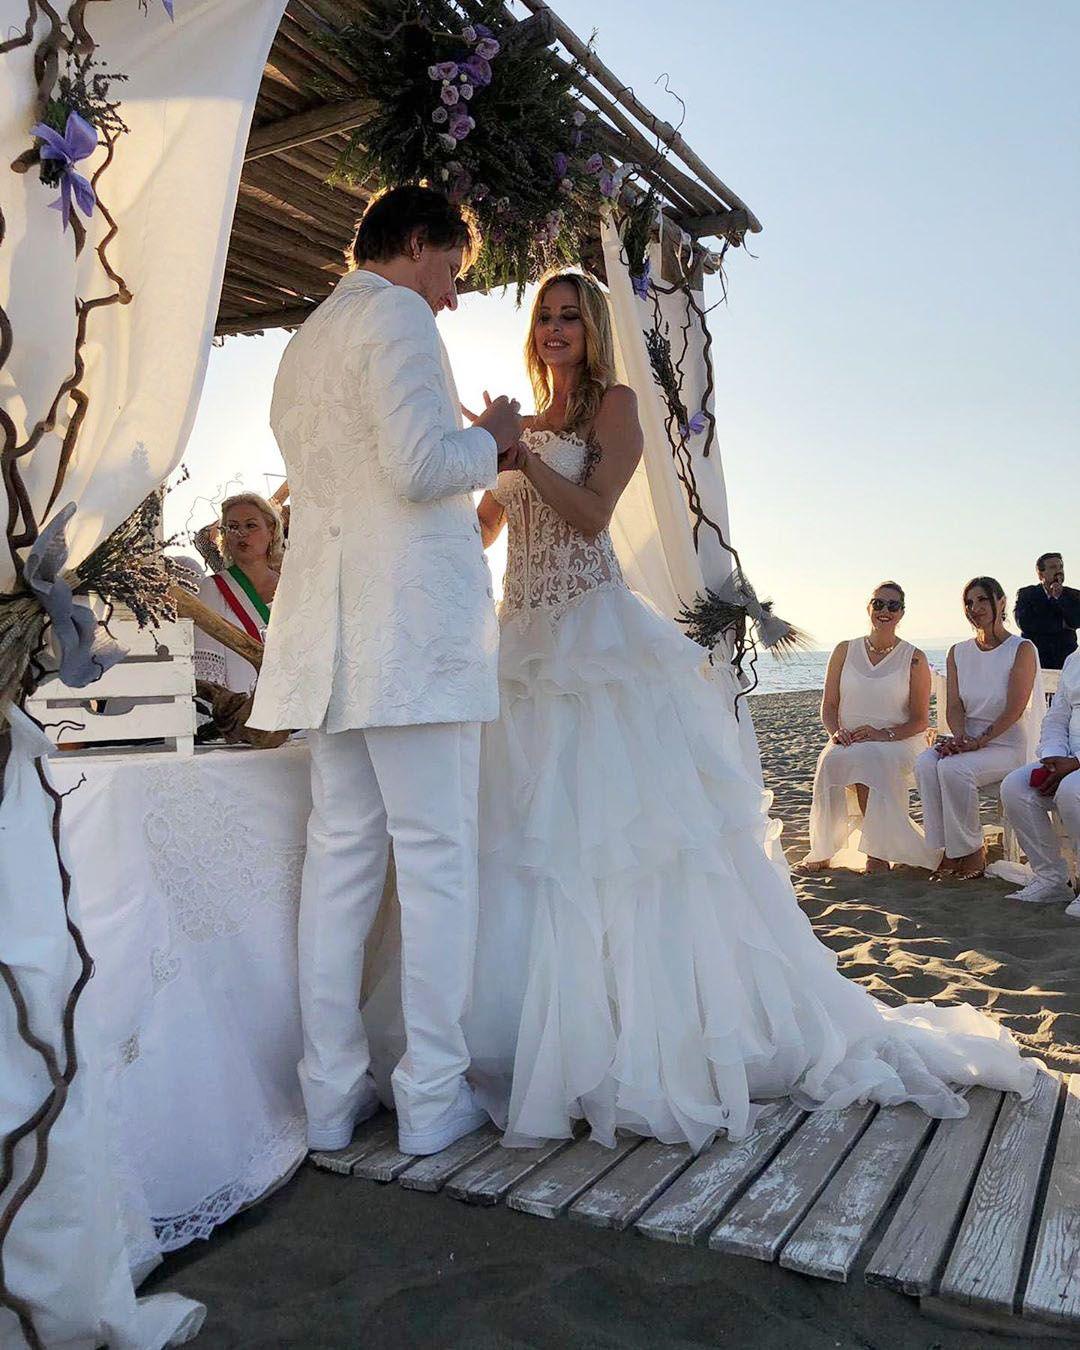 Stefania Orlando eSimone Gianlorenzidurante la cerimonia di nozze